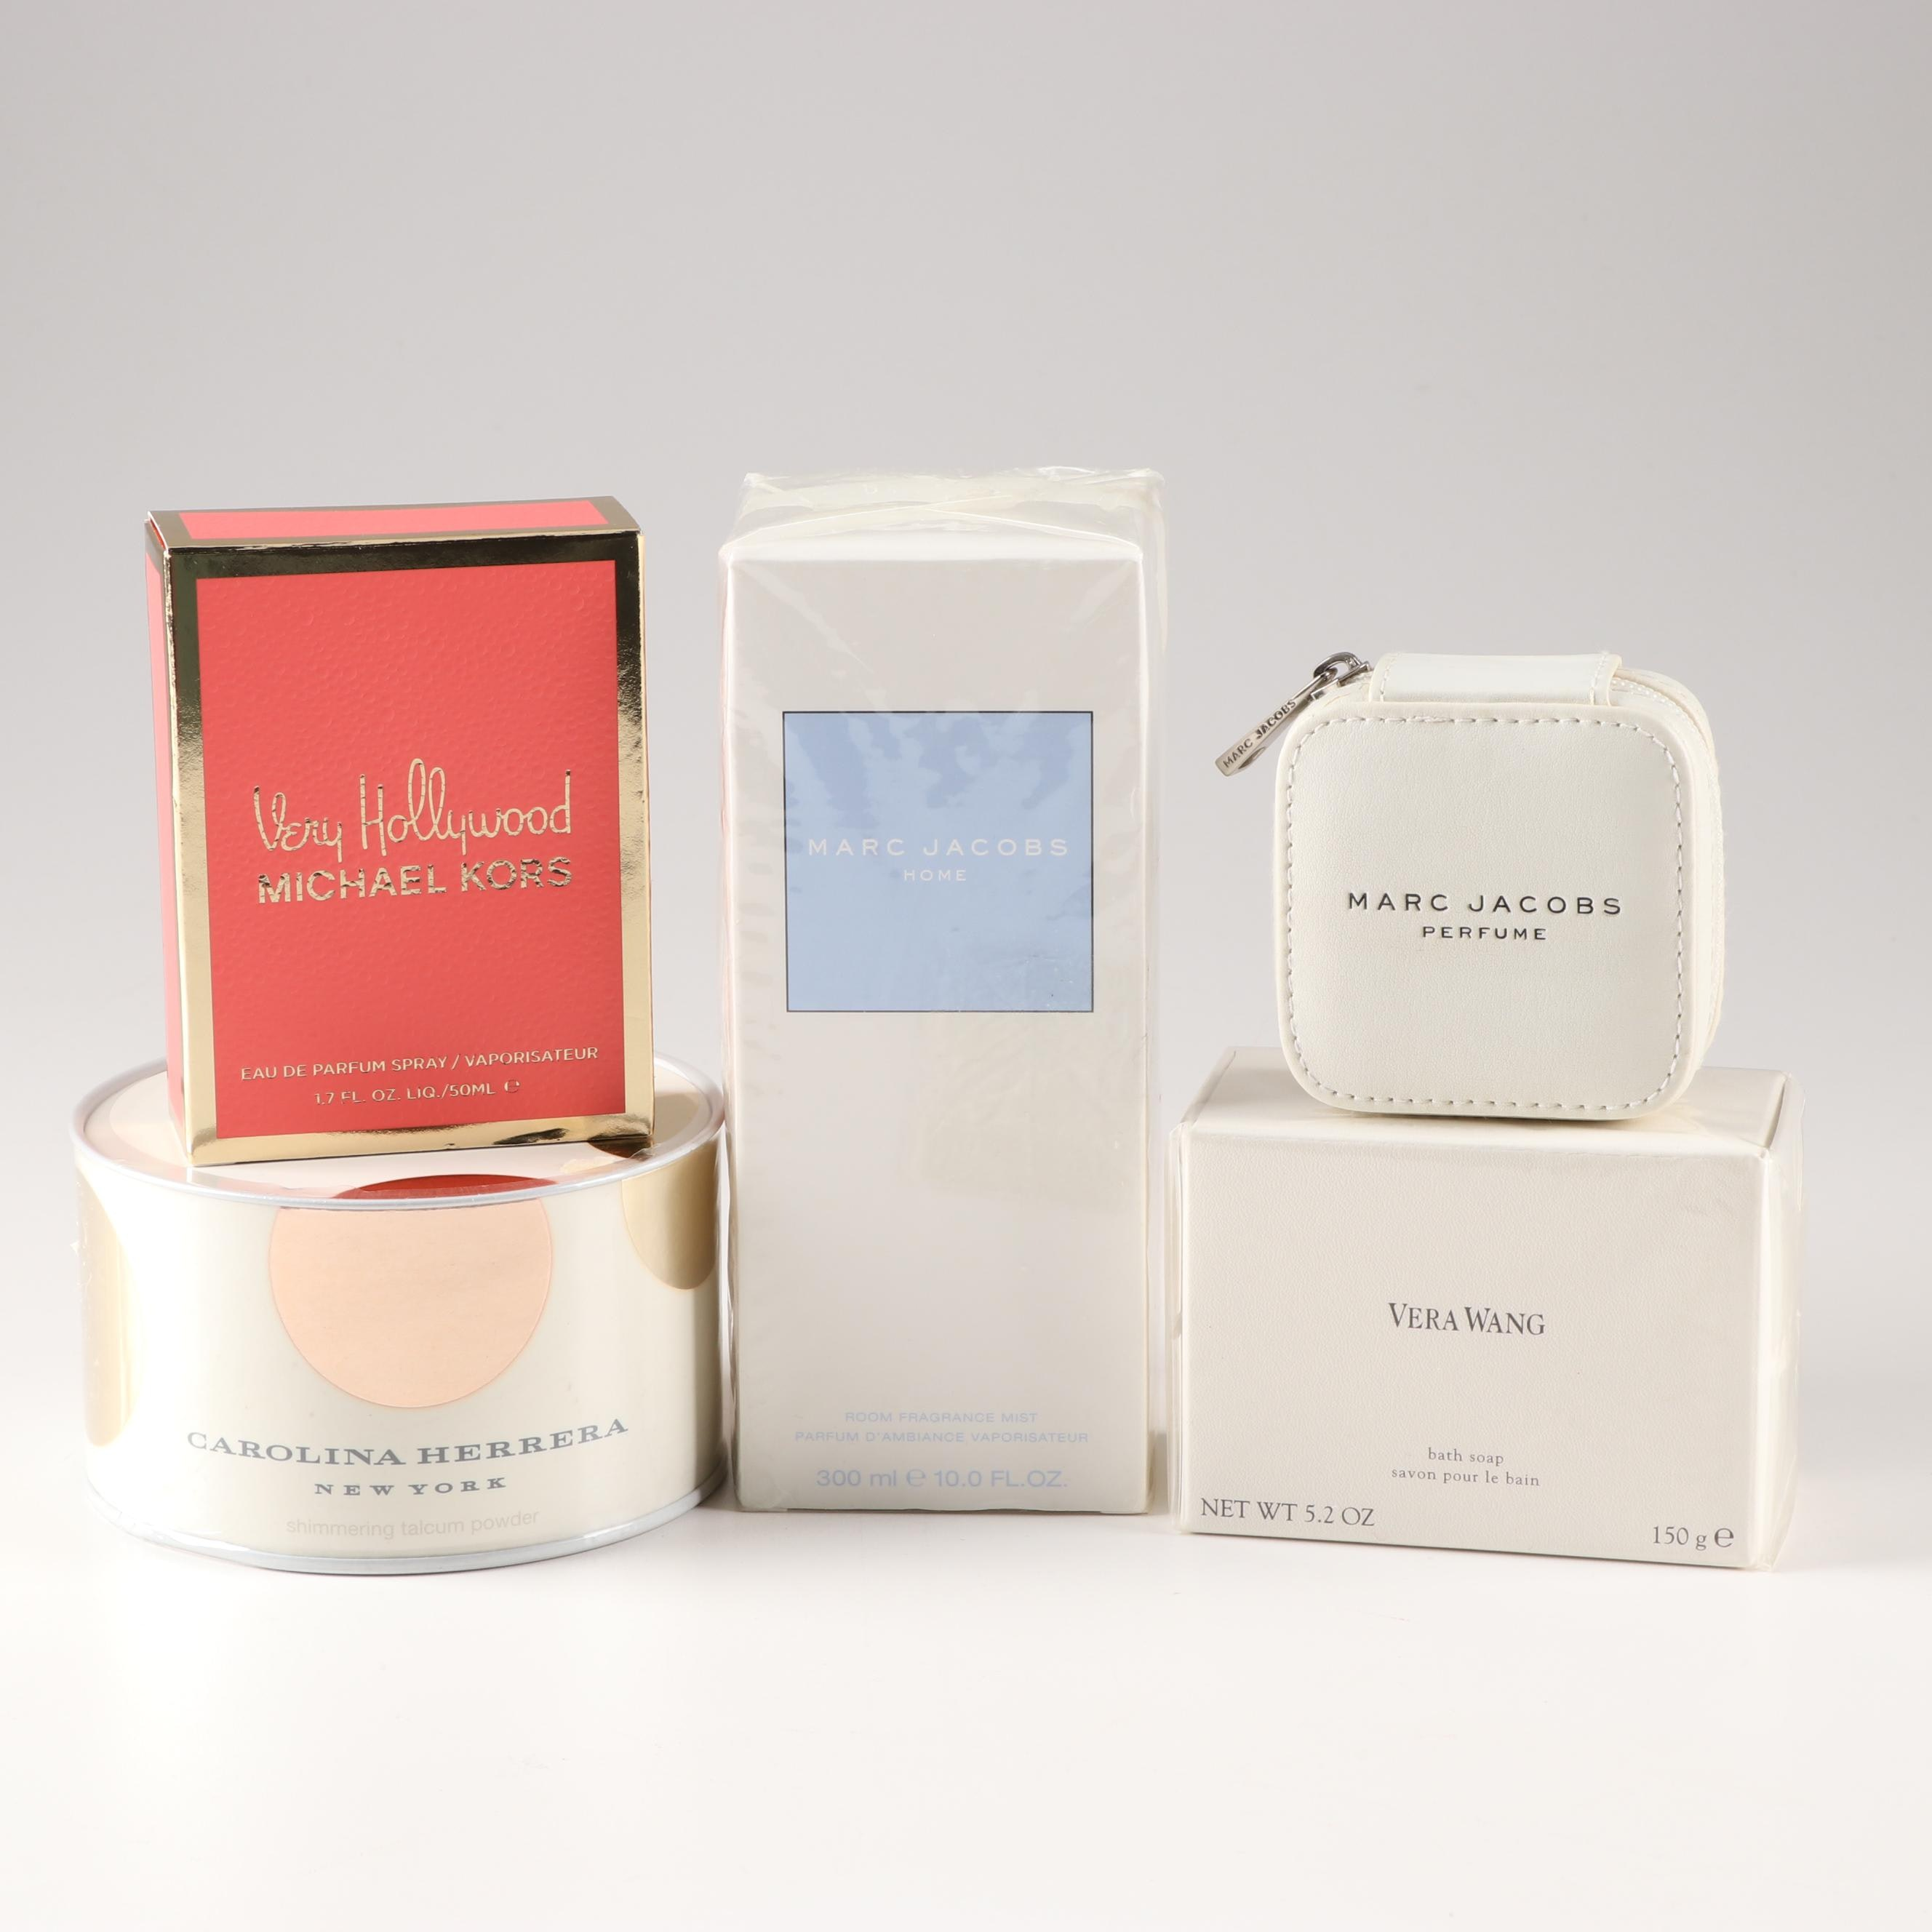 Marc Jacobs, Carolina Herrera and Vera Wang Powder, Perfume and Soap